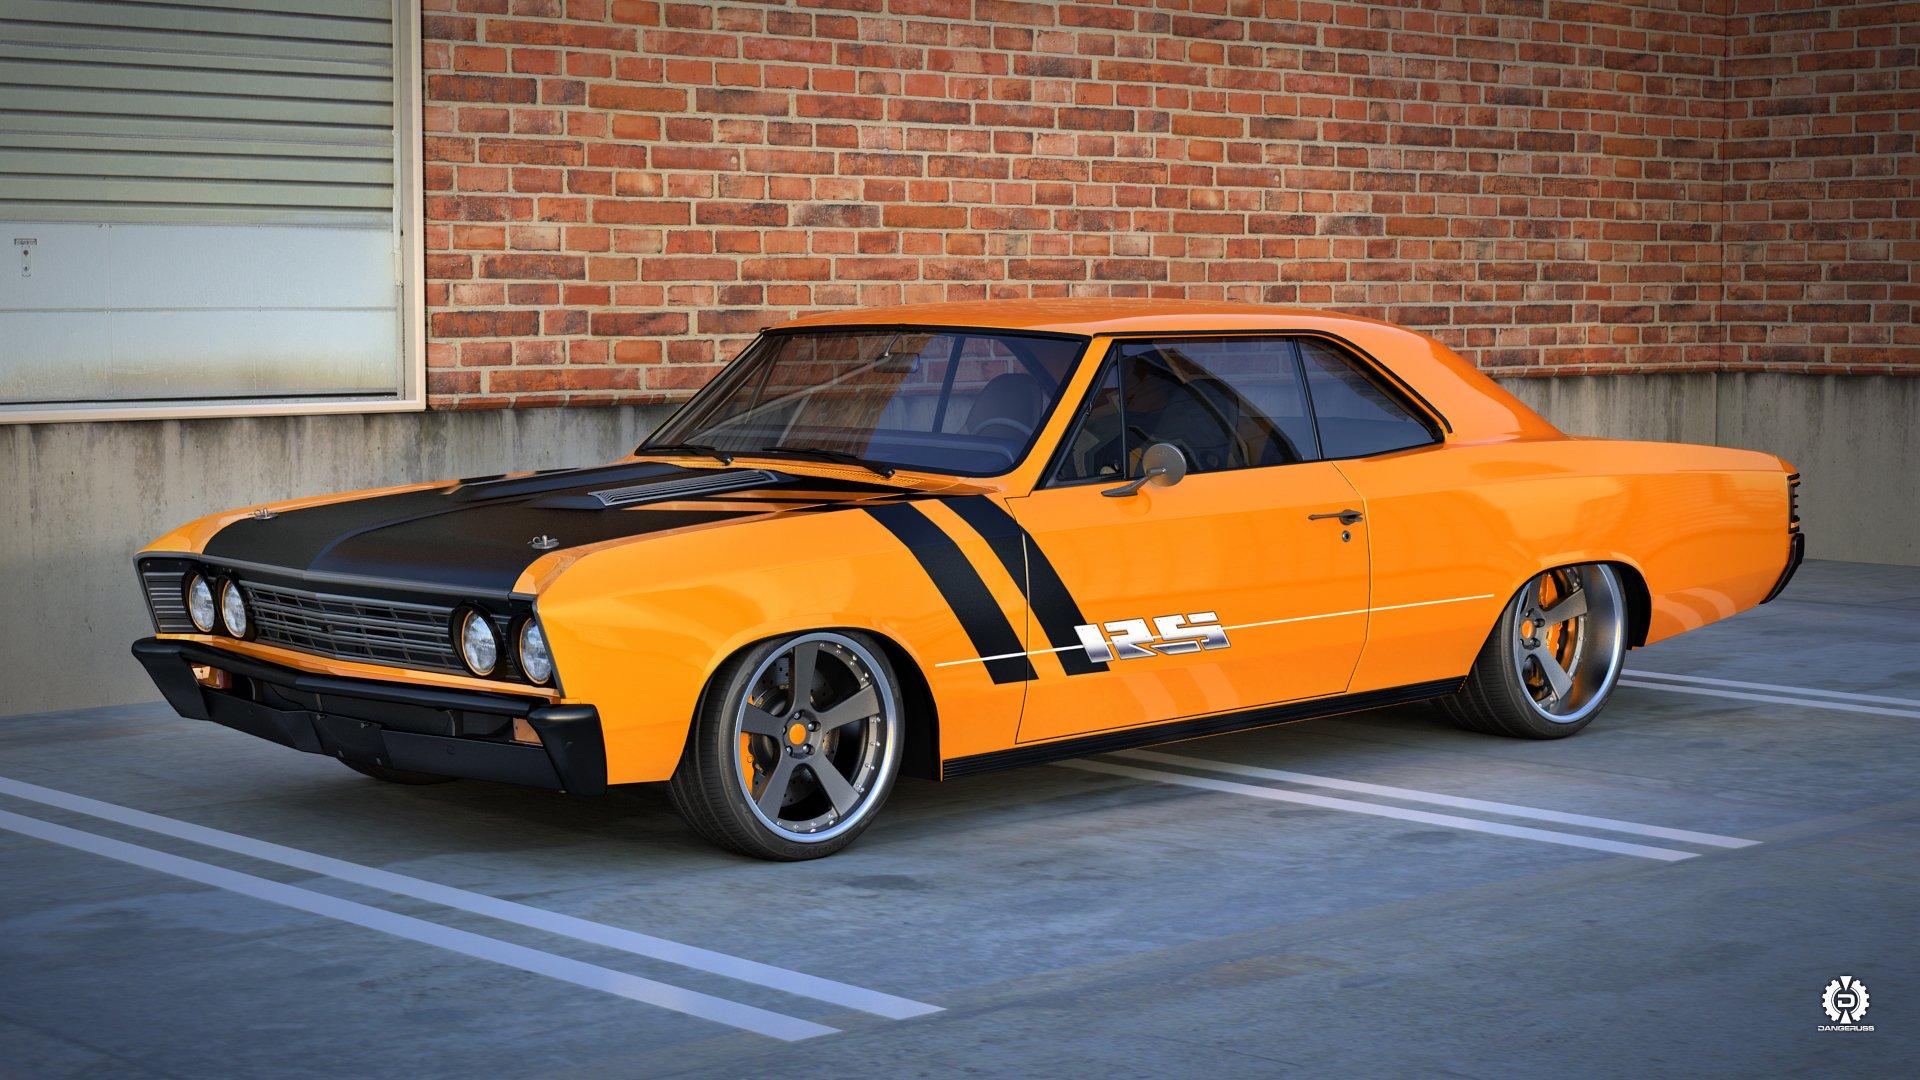 Chevelle Chevrolet Muscle Car Render Dangeruss Tuning Hot Rod Rods